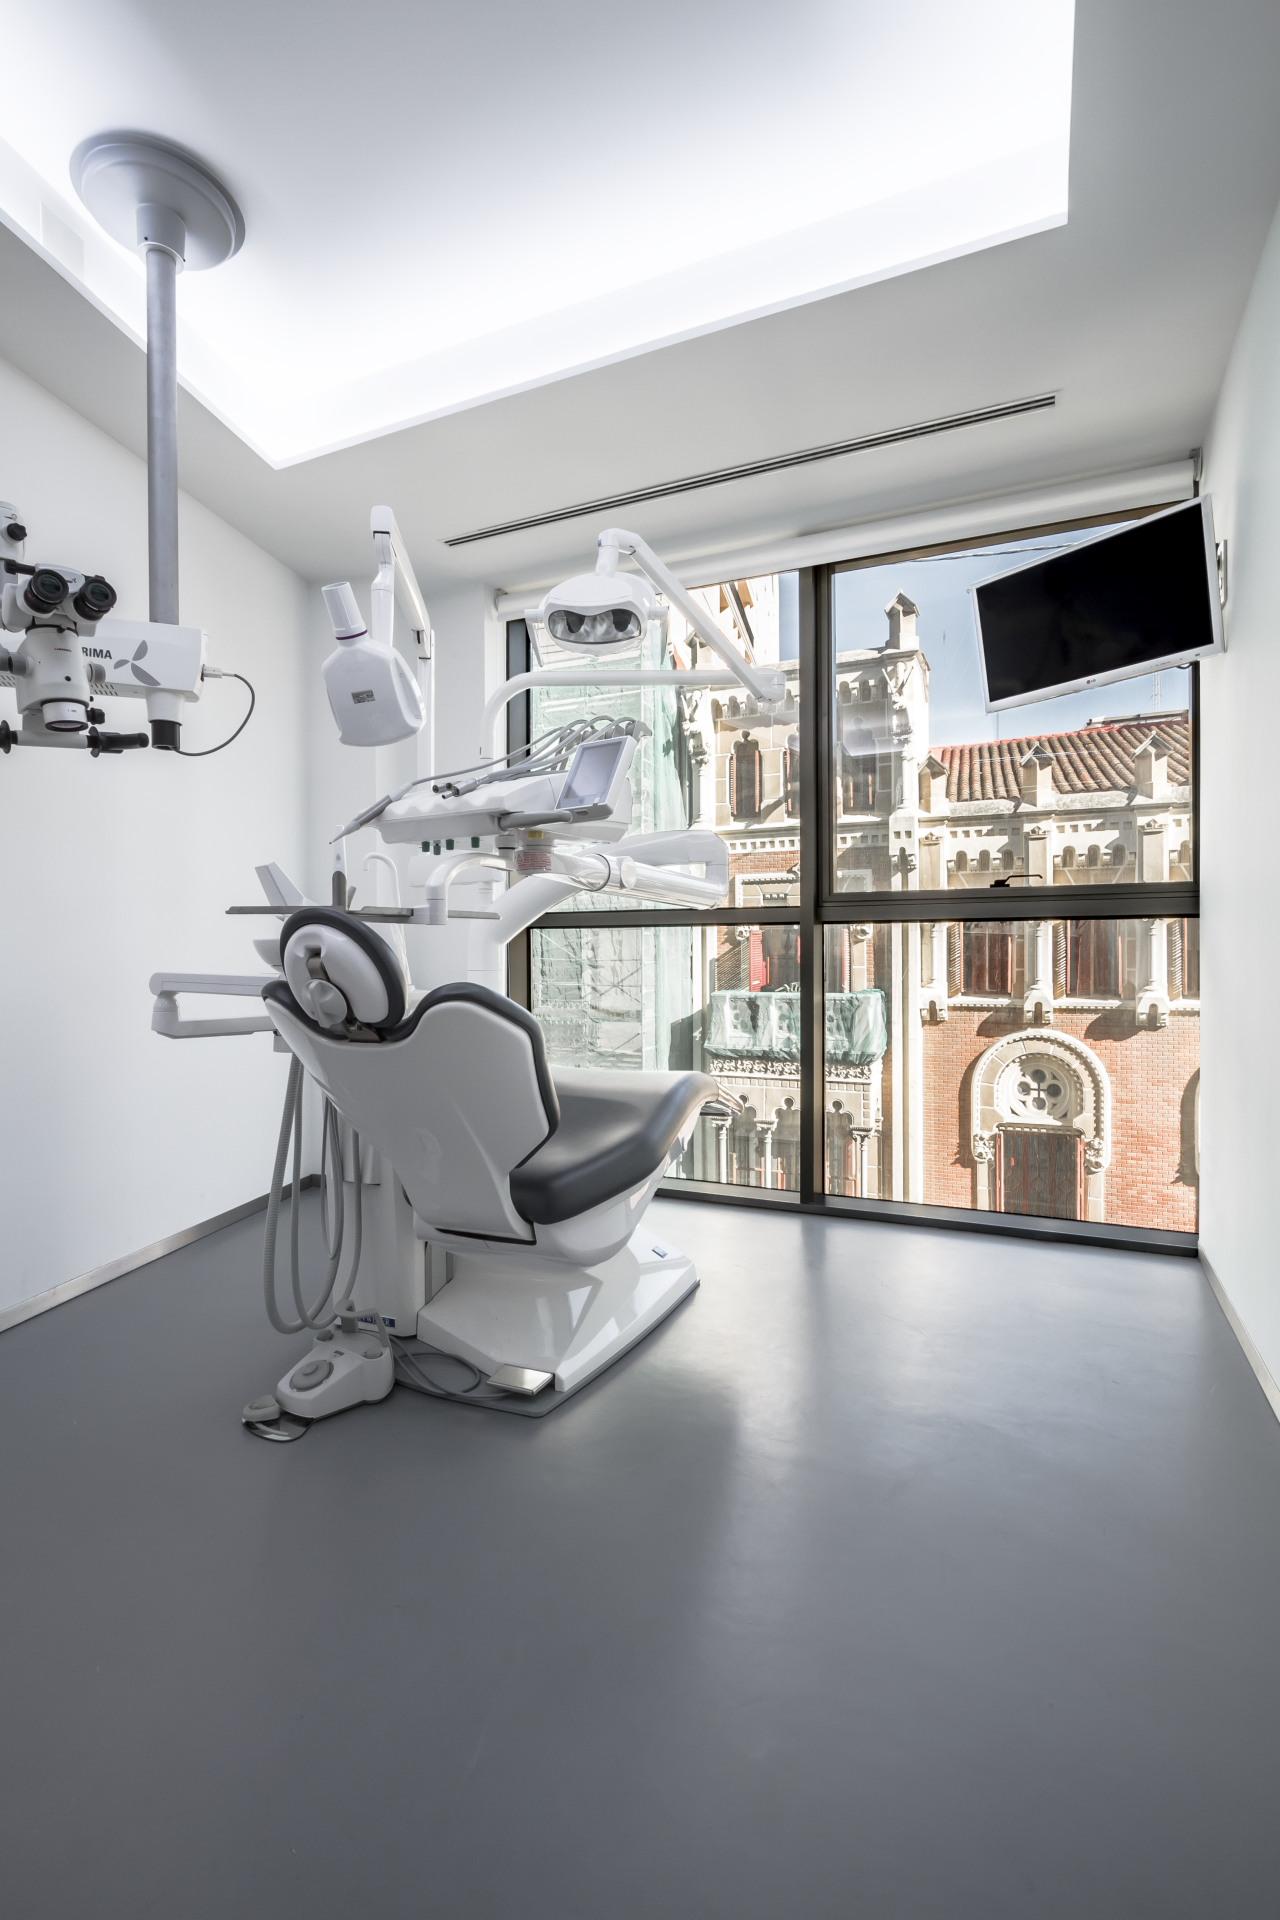 fotografia-arquitectura-valencia-german-cabo-hernandez-clinica (12)